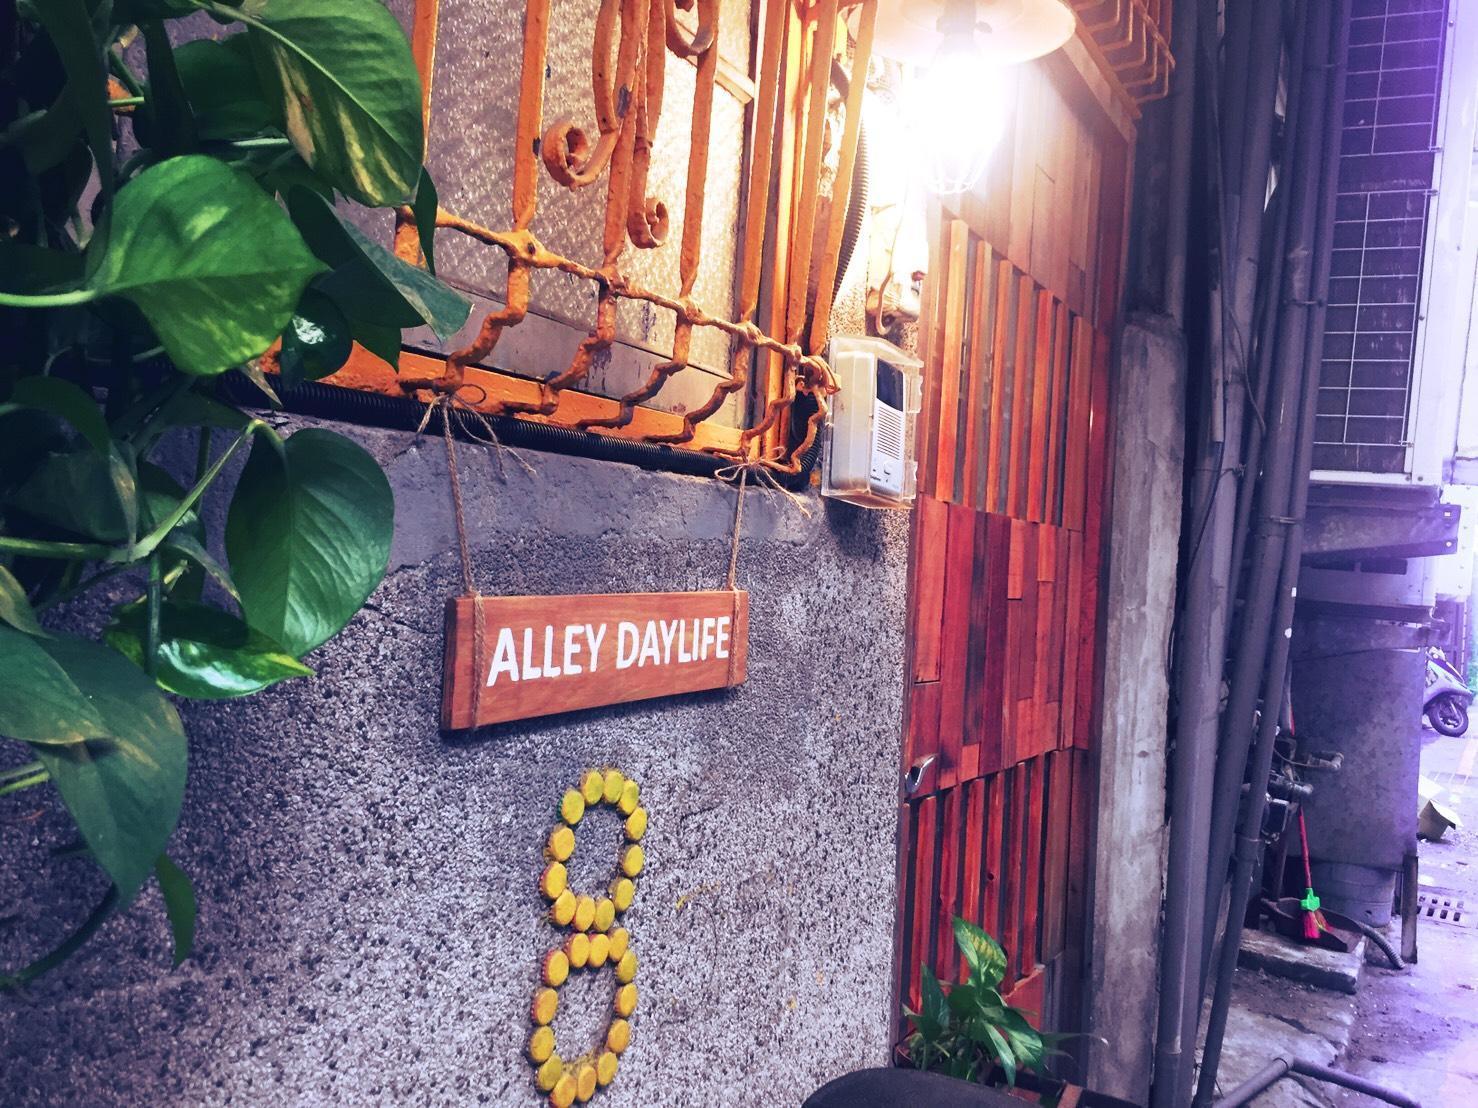 Alley Daylife